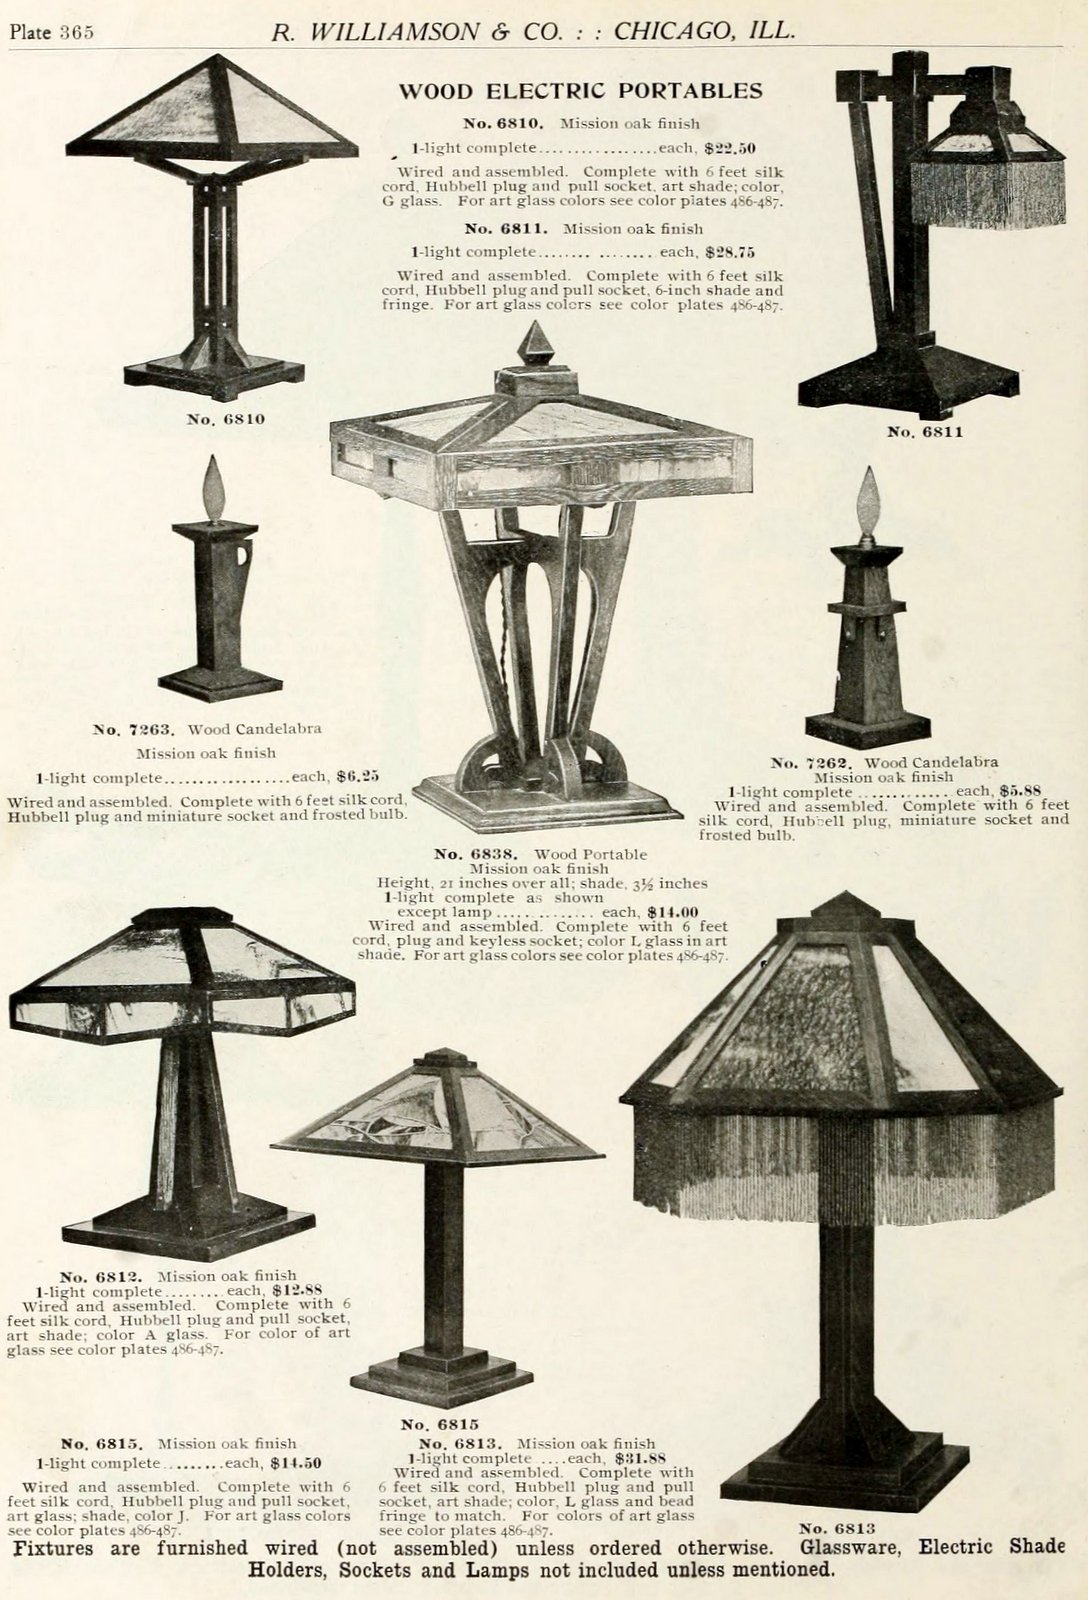 Antique lamp designs from around 1910 (3)